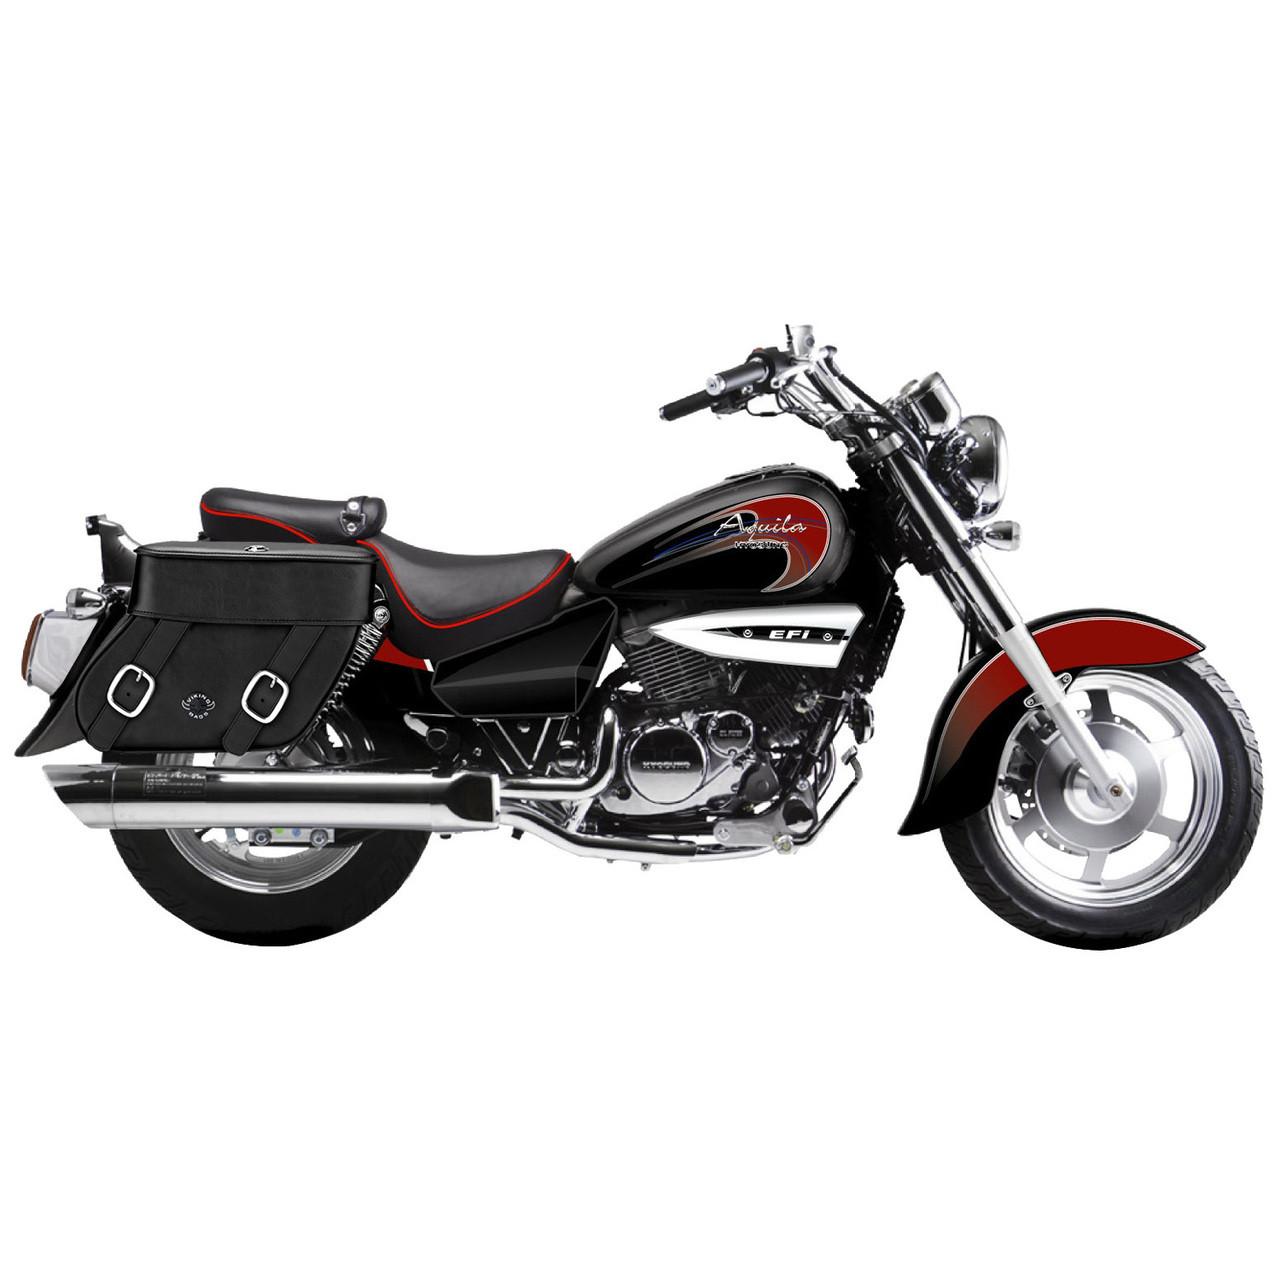 Hyosung Gv 250 Aquila Motorcycle Saddlebags Concord Leather Plain